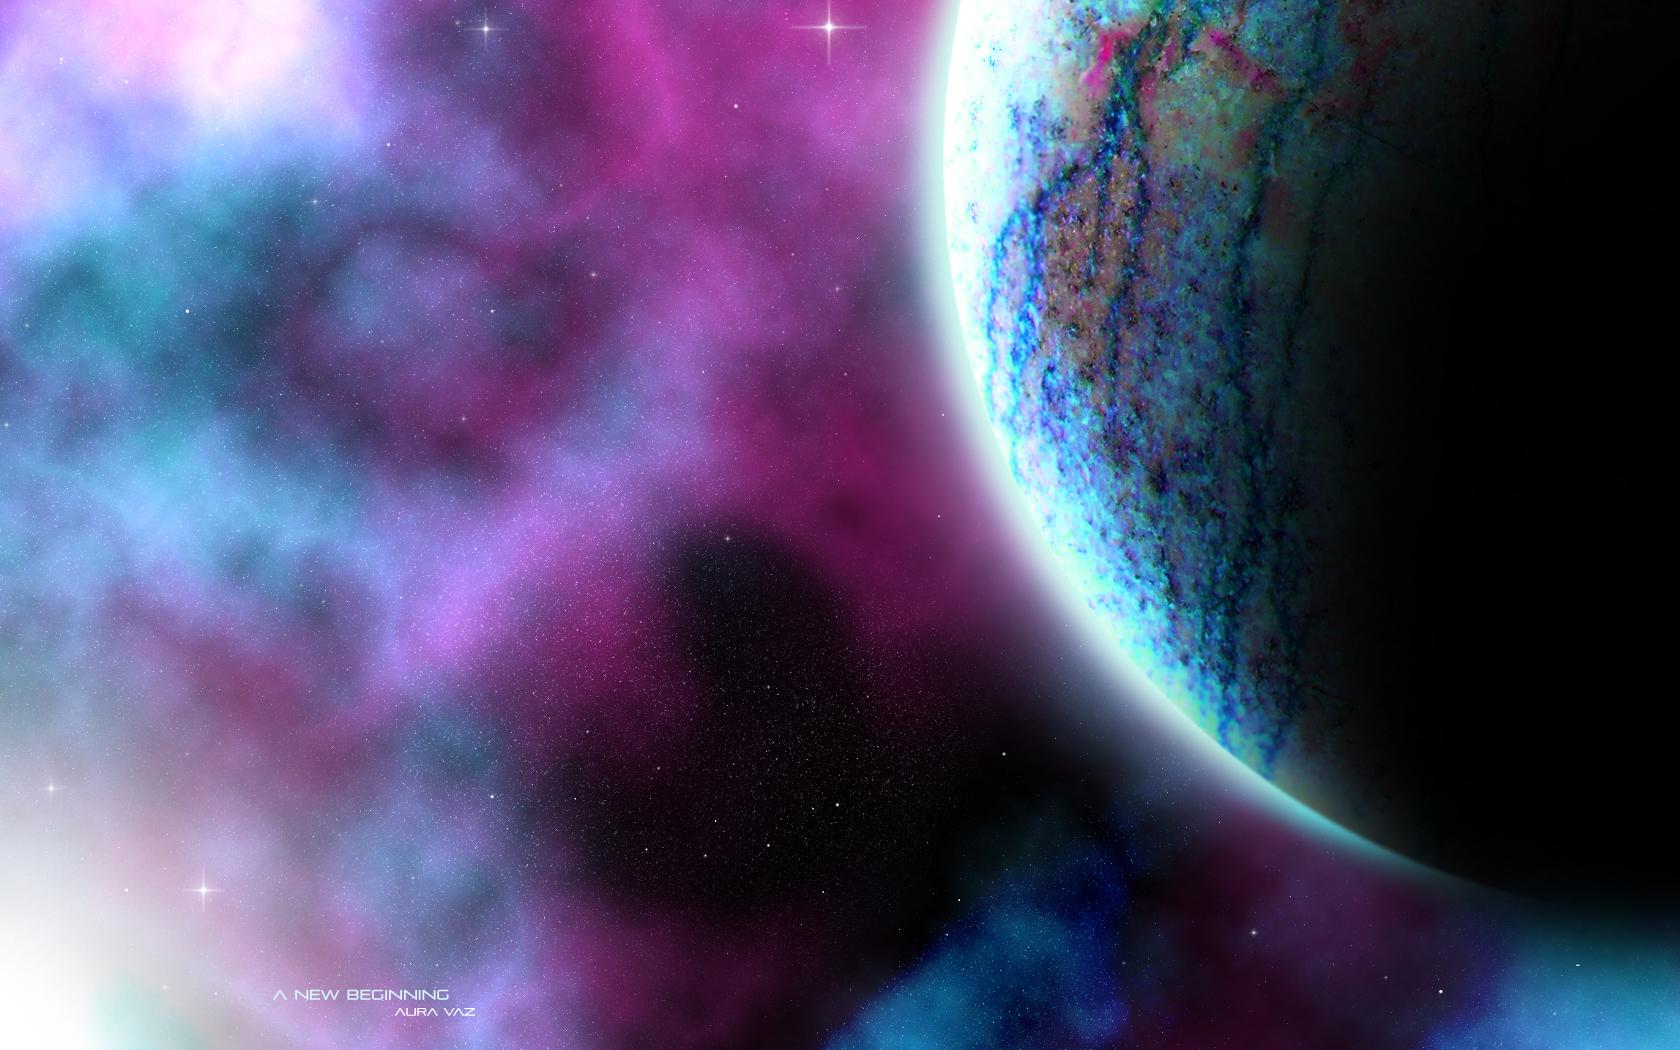 Para quem gosta de space art (meus:P) A_new_begining_wallpaper_by_auravaz-d30mugn